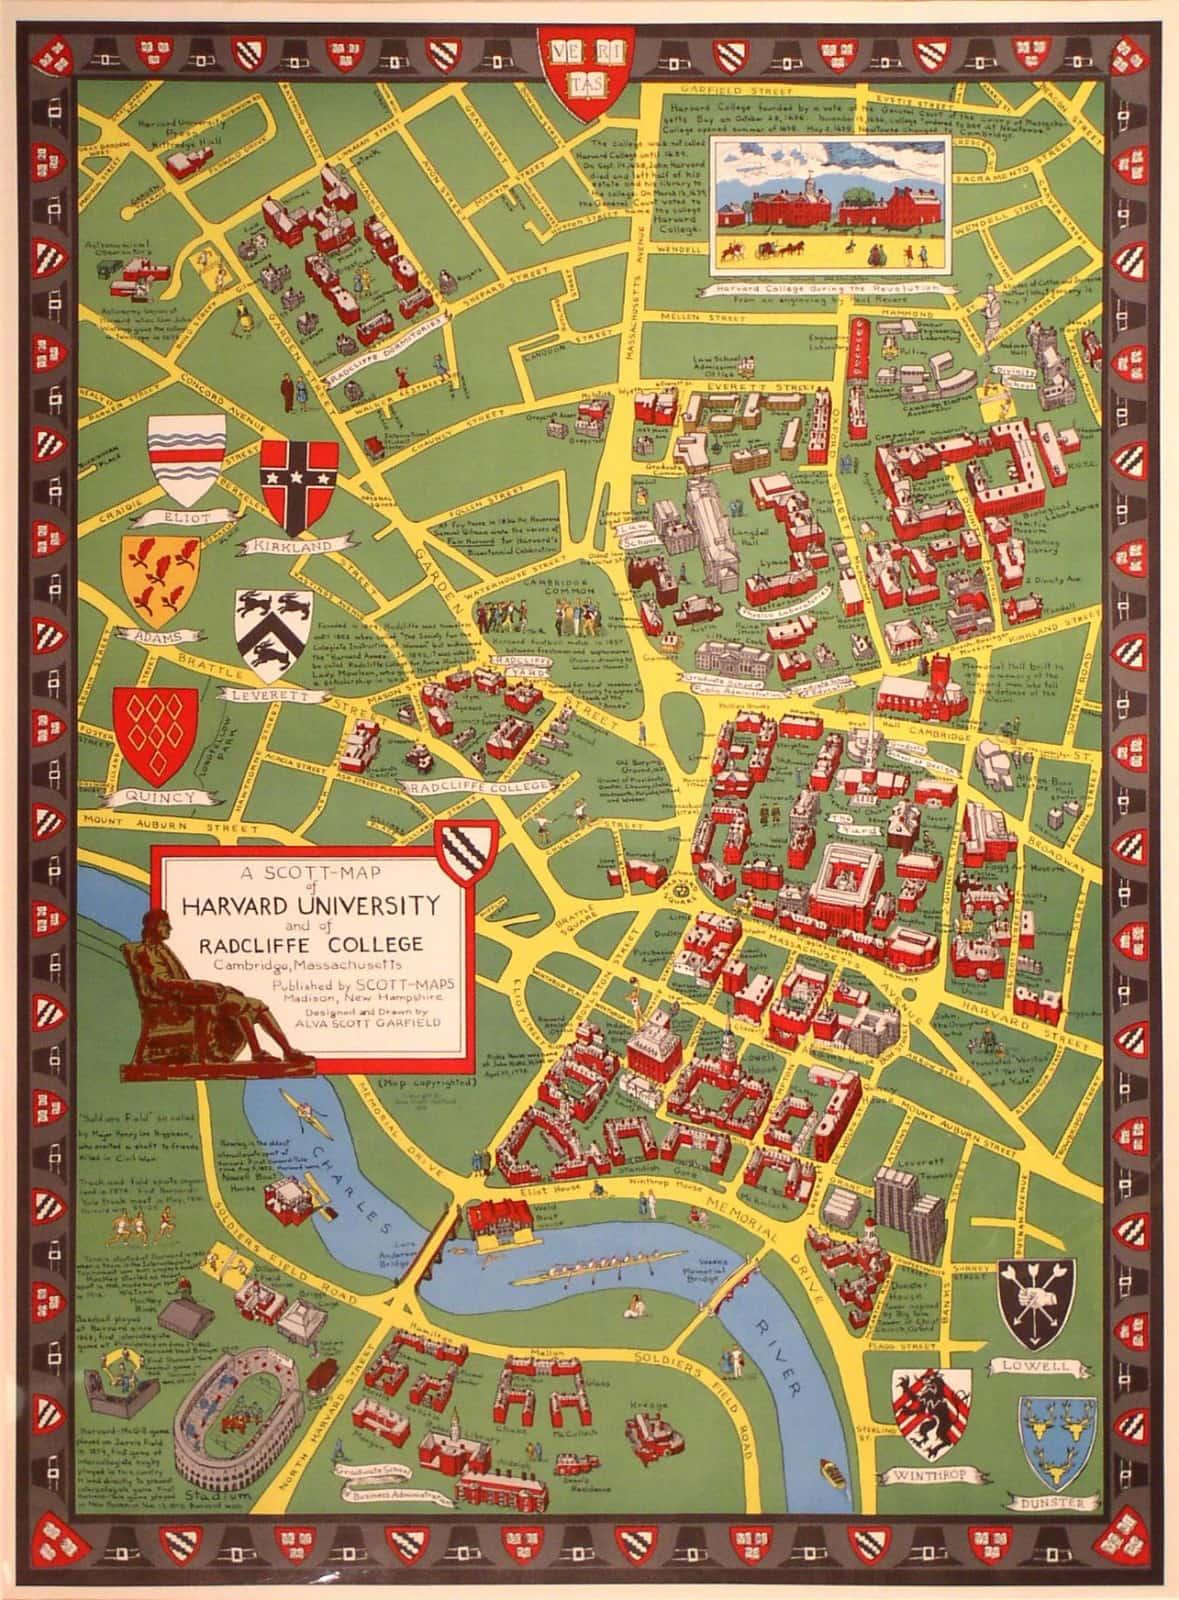 1959 Alva Scott Garfield pictorial map of Harvard - Rare ... Map Of Al Va on sf va map, sw va map, co va map, ky va map, dc va map, no va map,